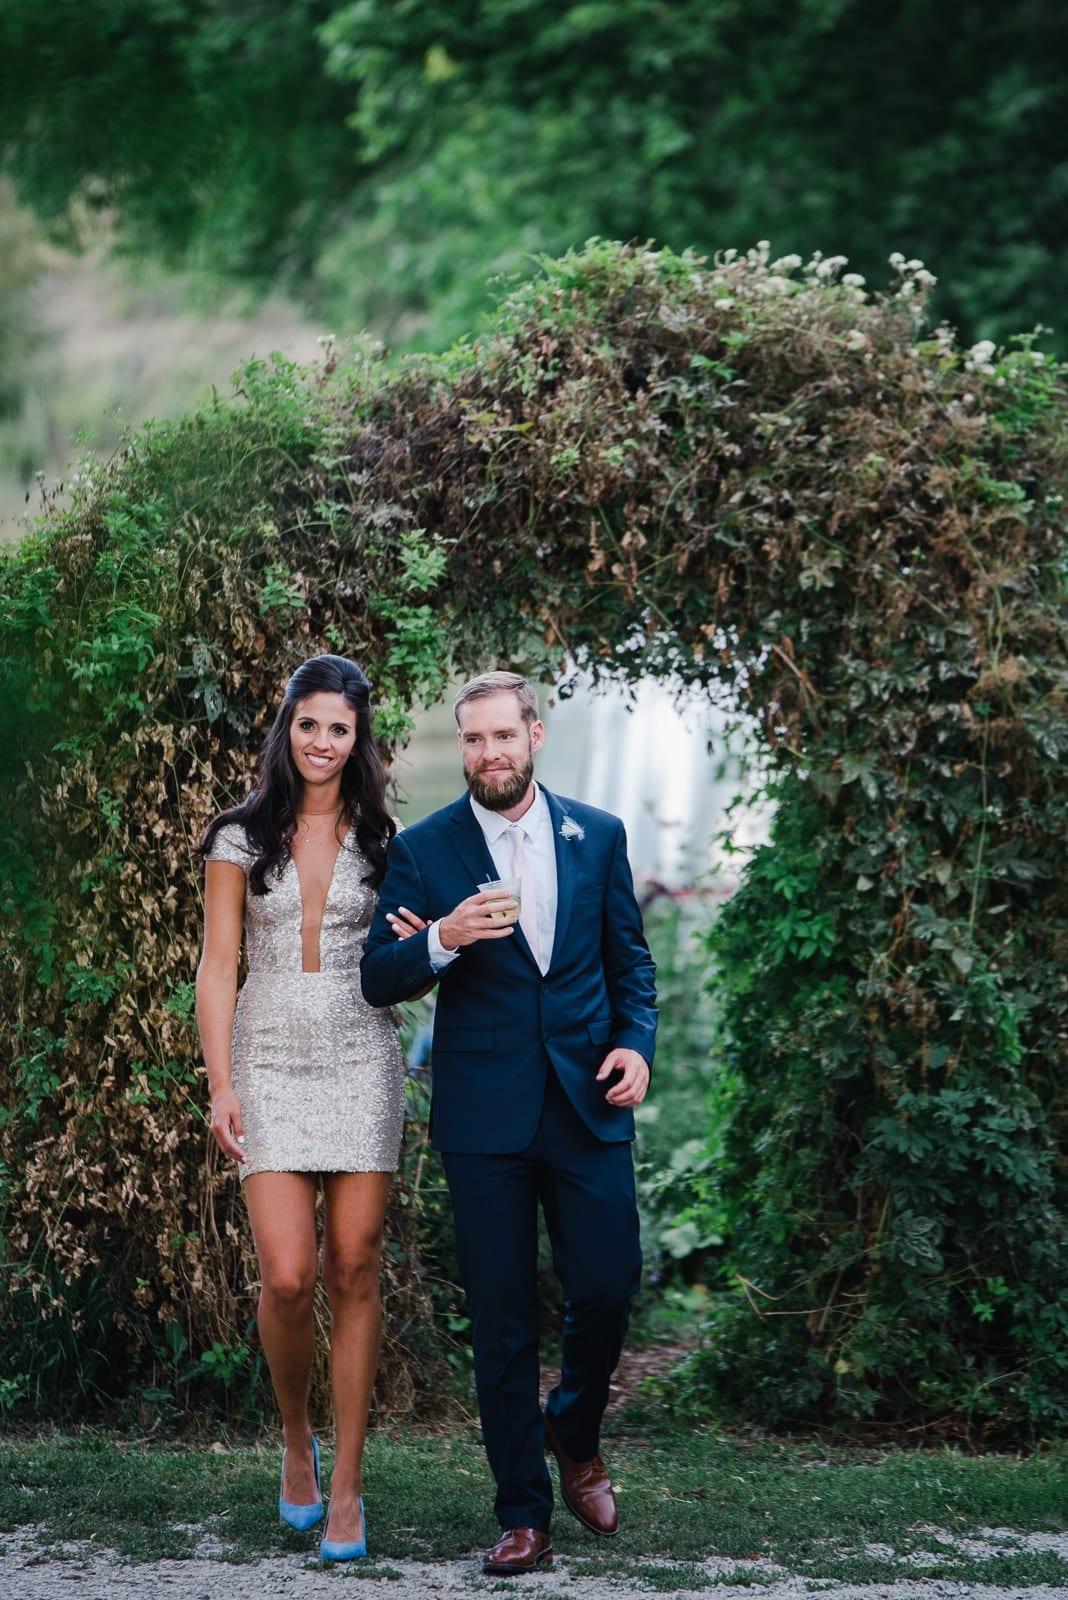 Glamorous wedding reception style by Josie V Photography